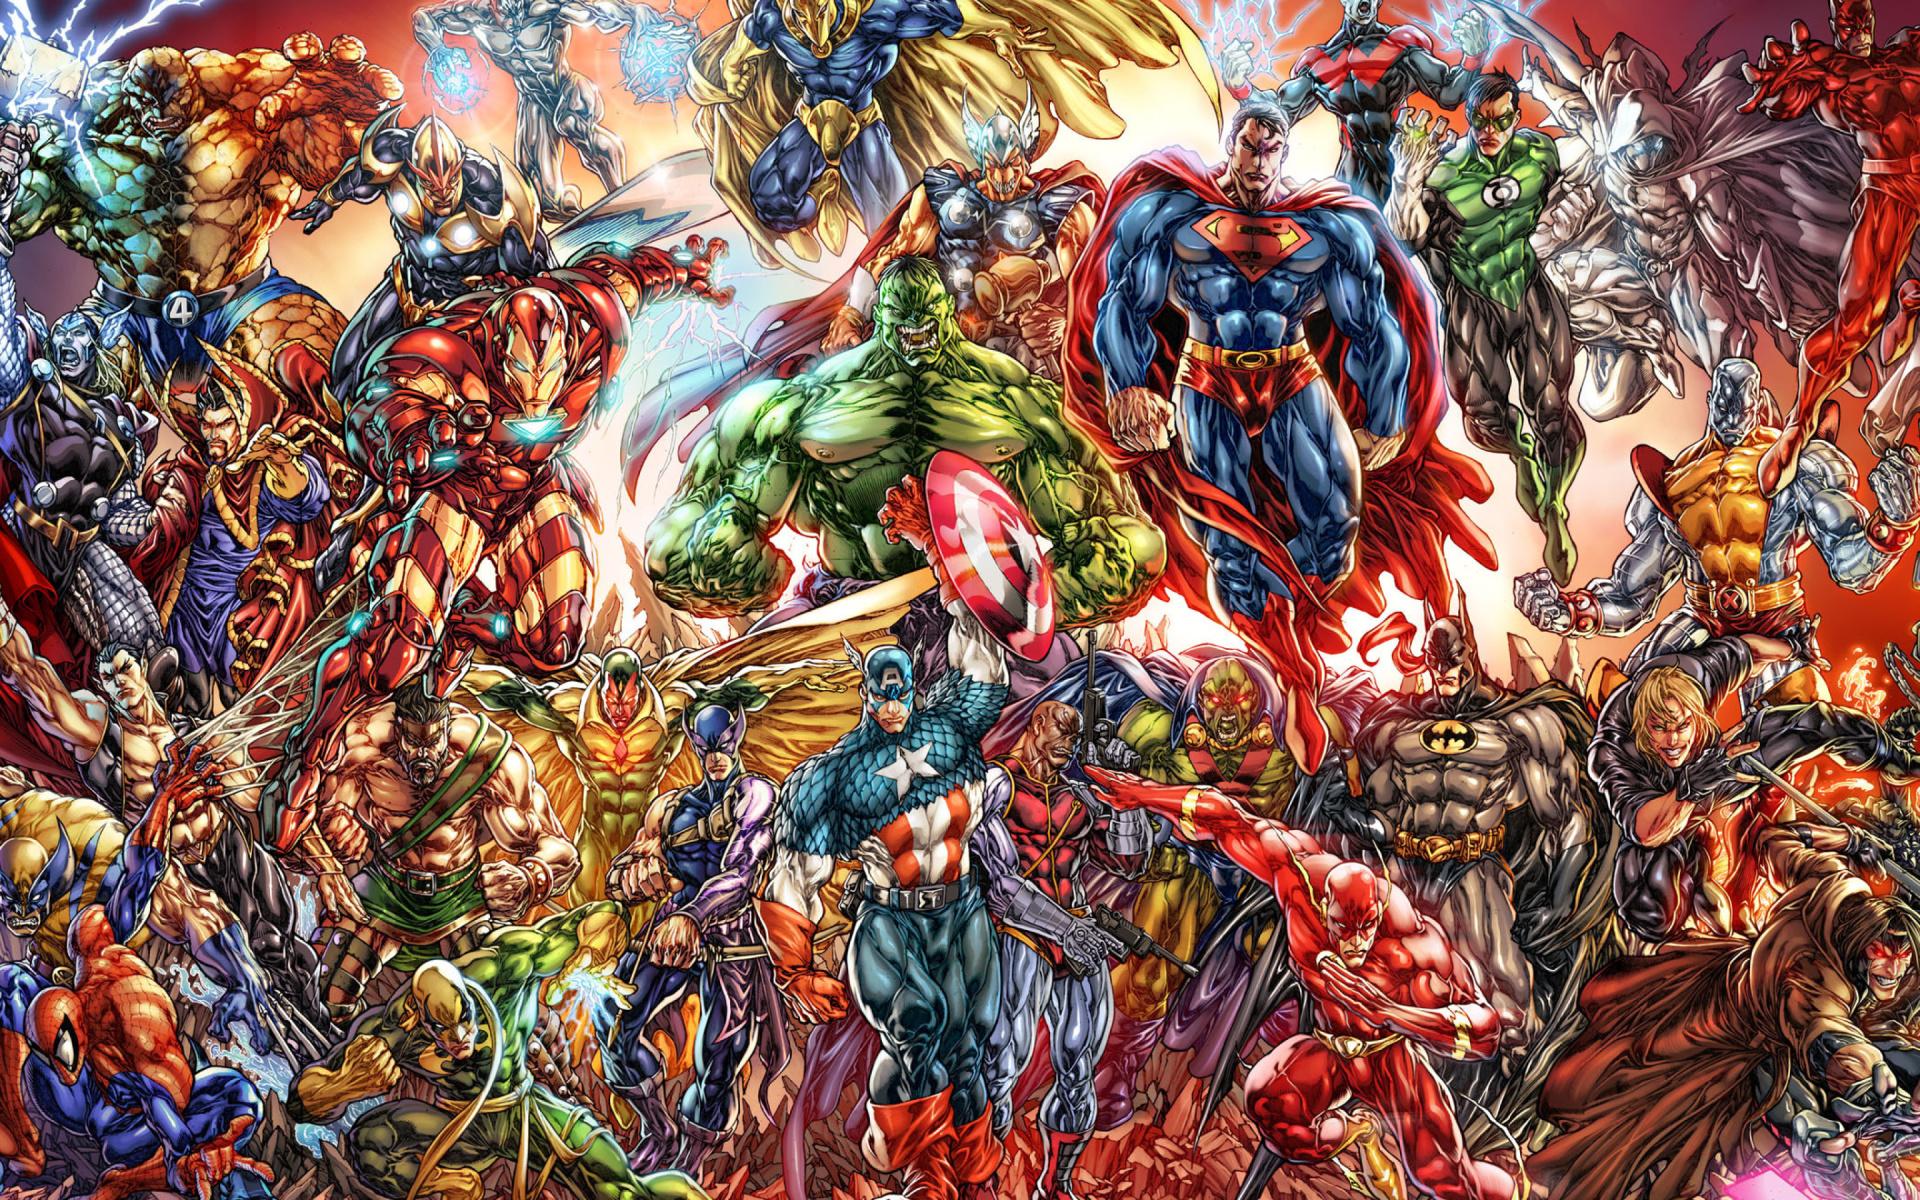 Descargar Fondos de Pantalla de Marvel Comics Descargar el Fondo de Pantalla